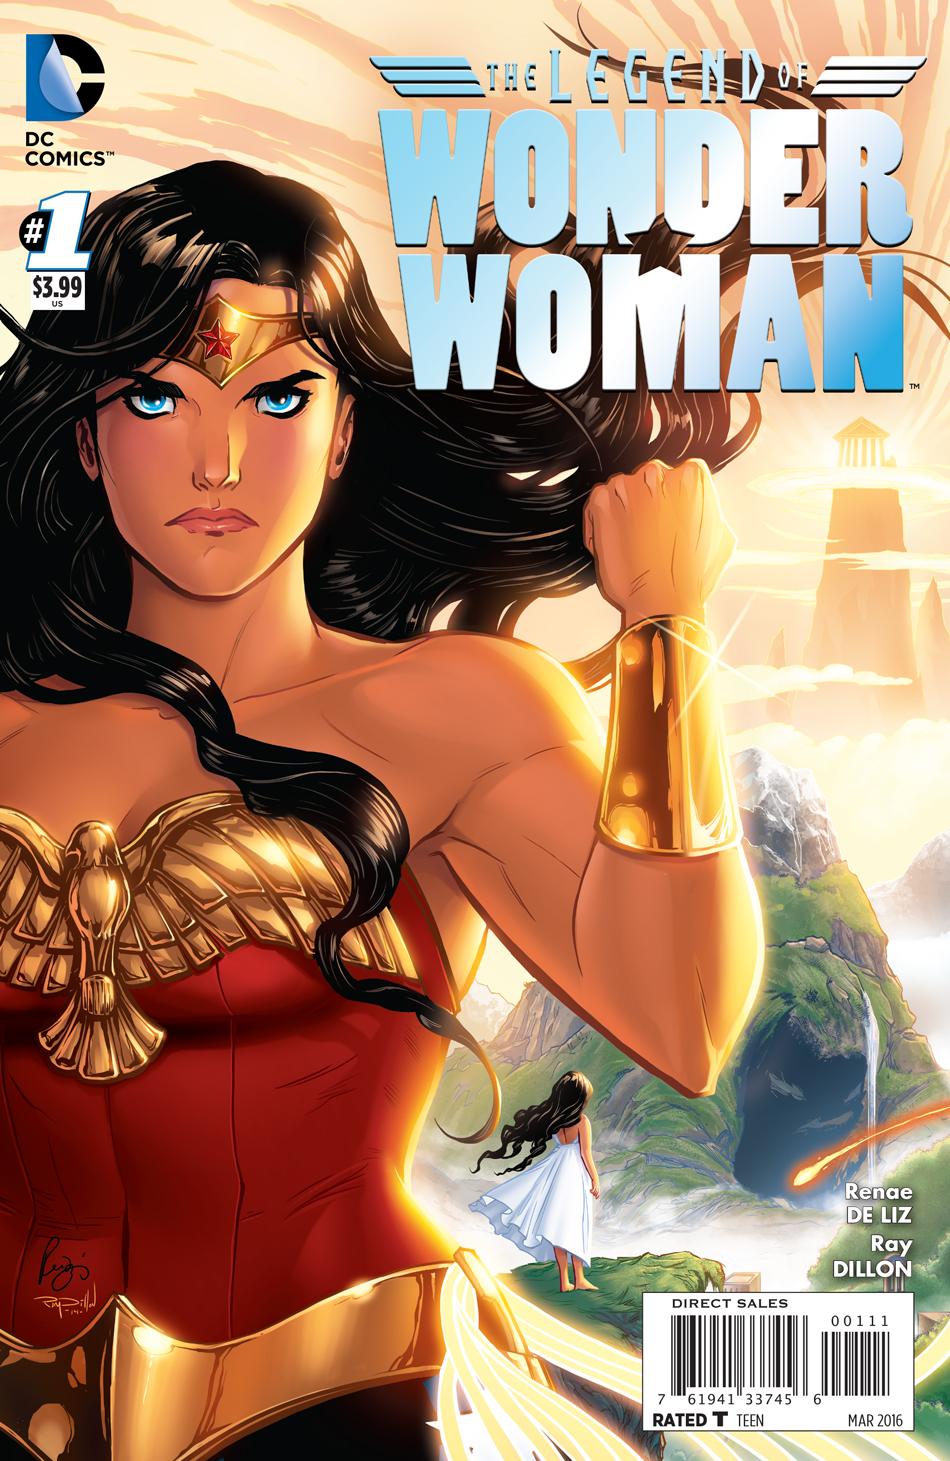 Oc's Comics Magazine - Magazine cover